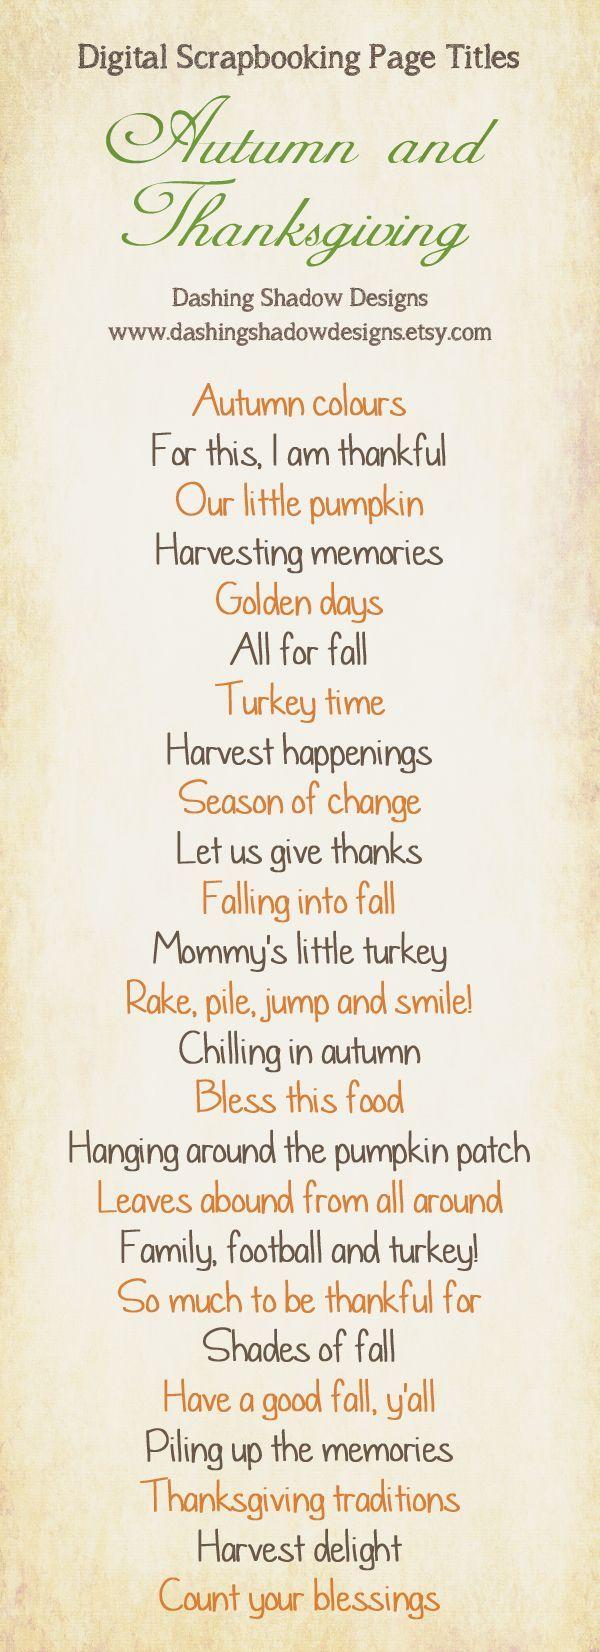 Autumn & Thanksgiving scrapbook layout titles.